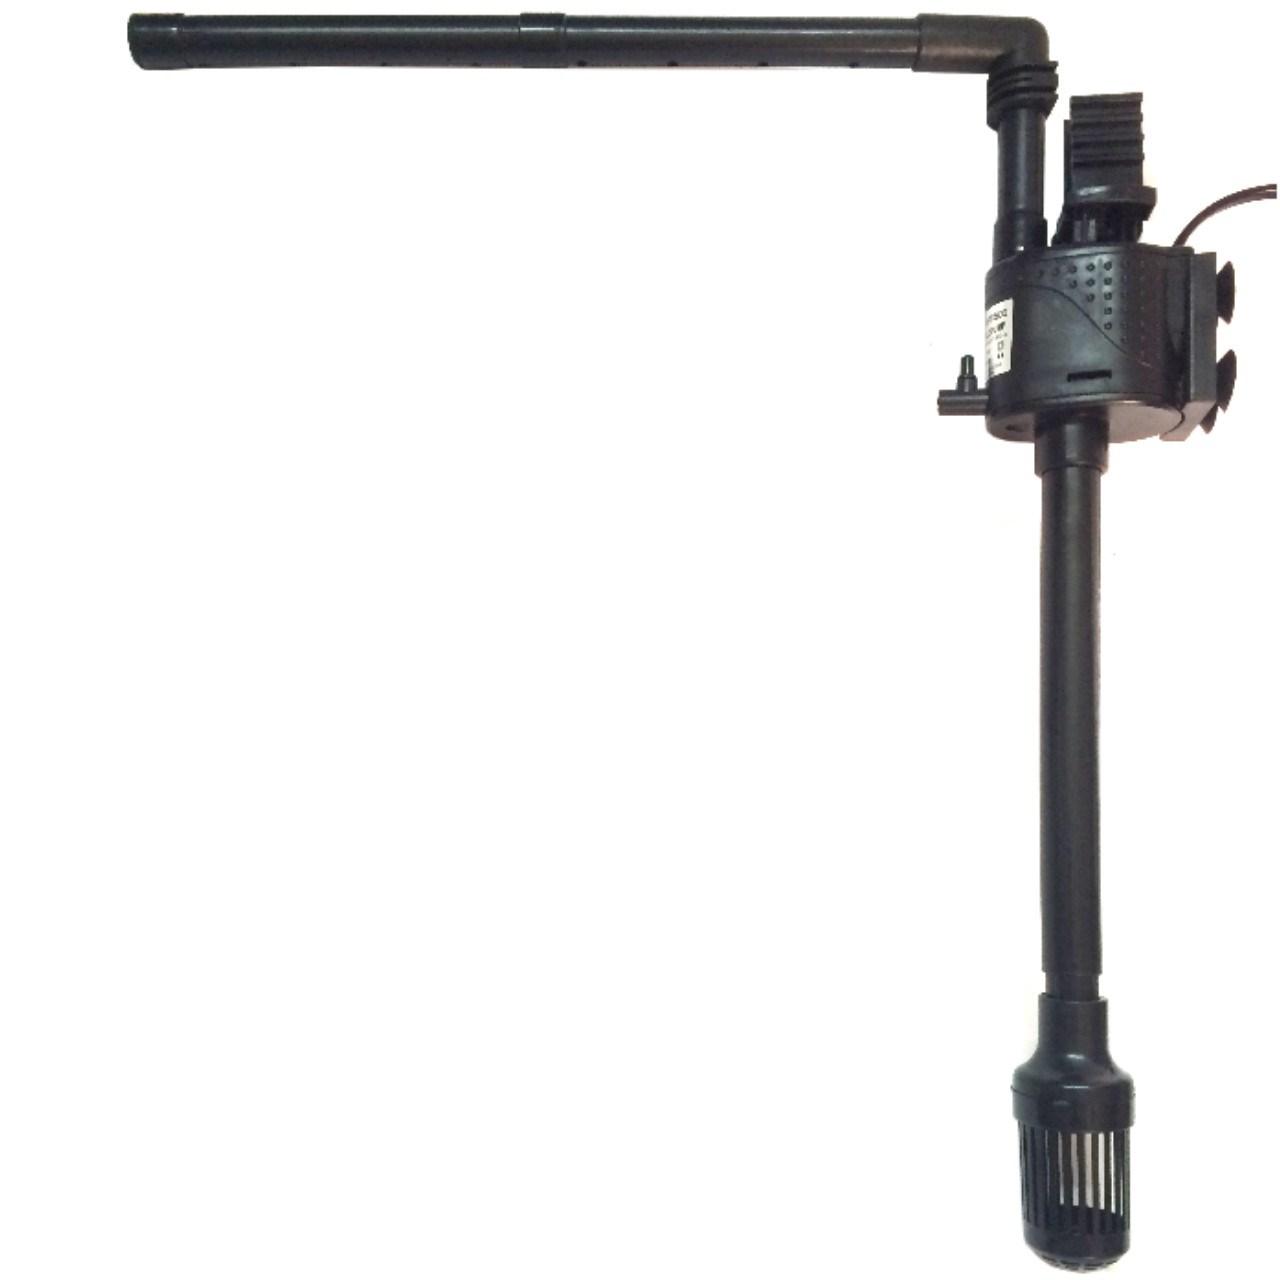 فیلتر  آبشاری شناور آکواریوم آکوا مدل WPT-600